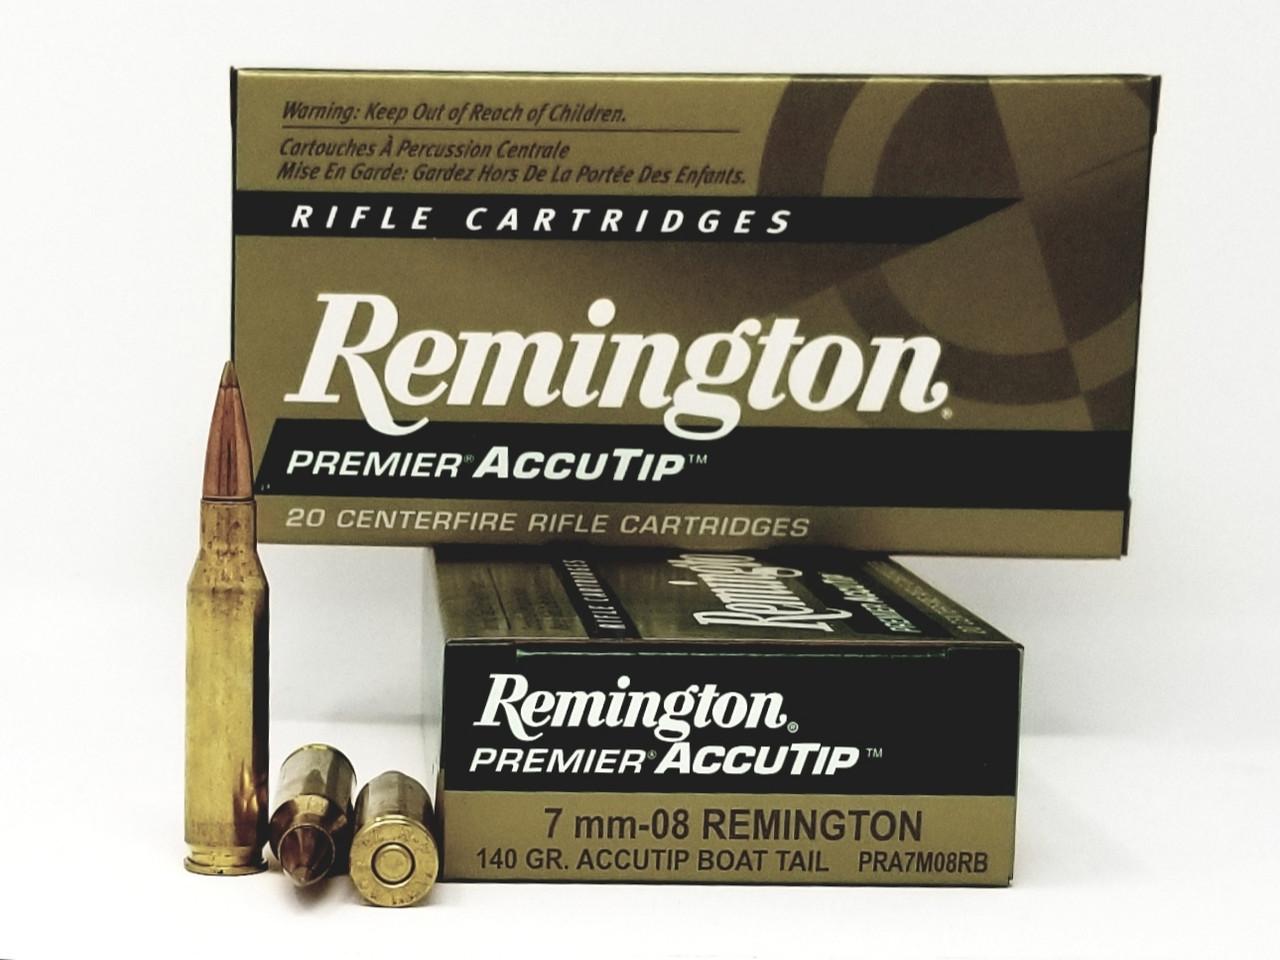 7mm-08 Rem Ammo